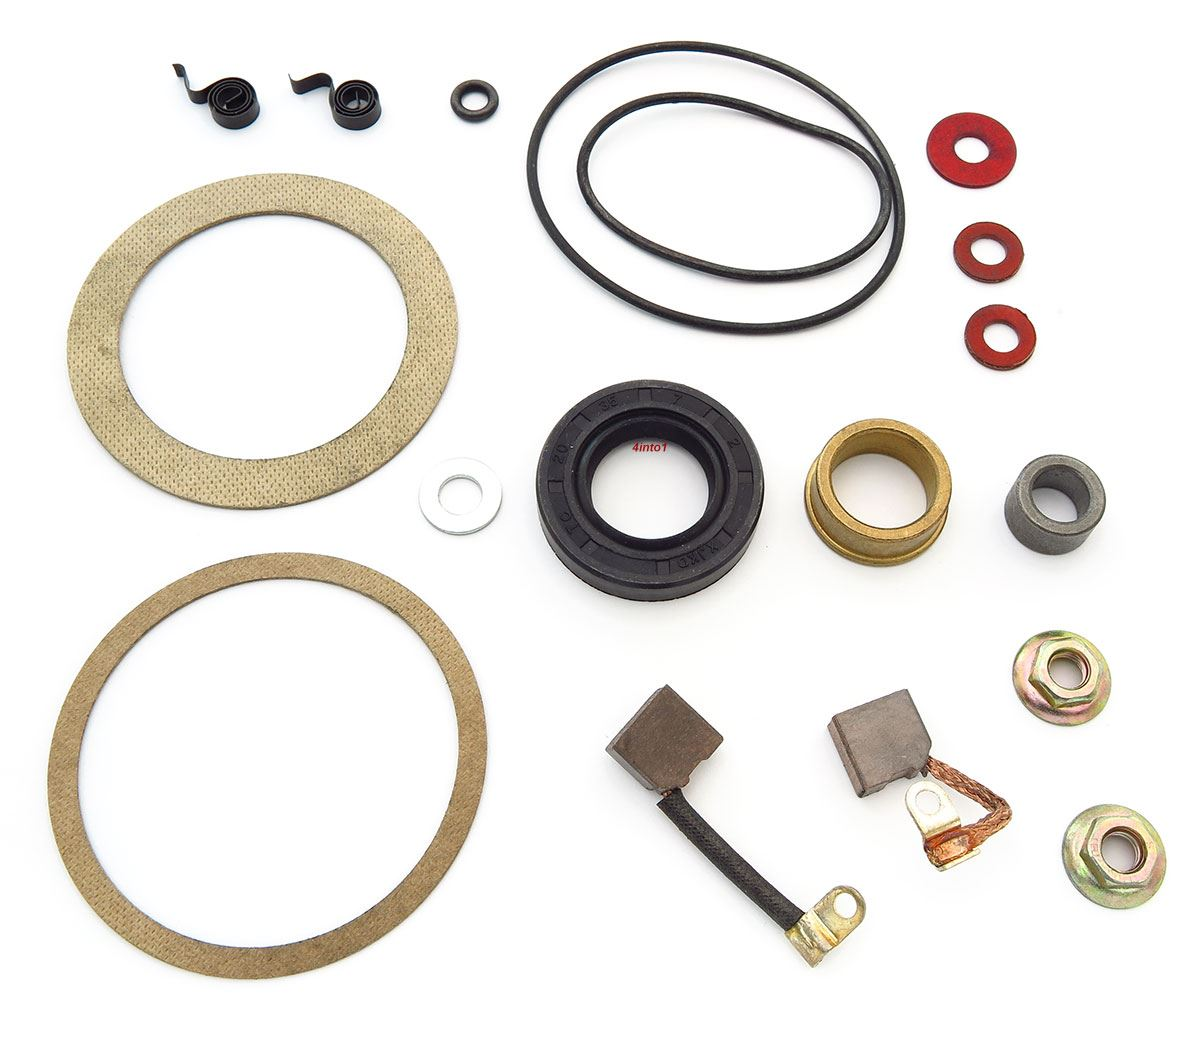 Arrowhead Starter Motor Rebuild Kit Honda 175 200 350 And 360 Smu9118 Ebay